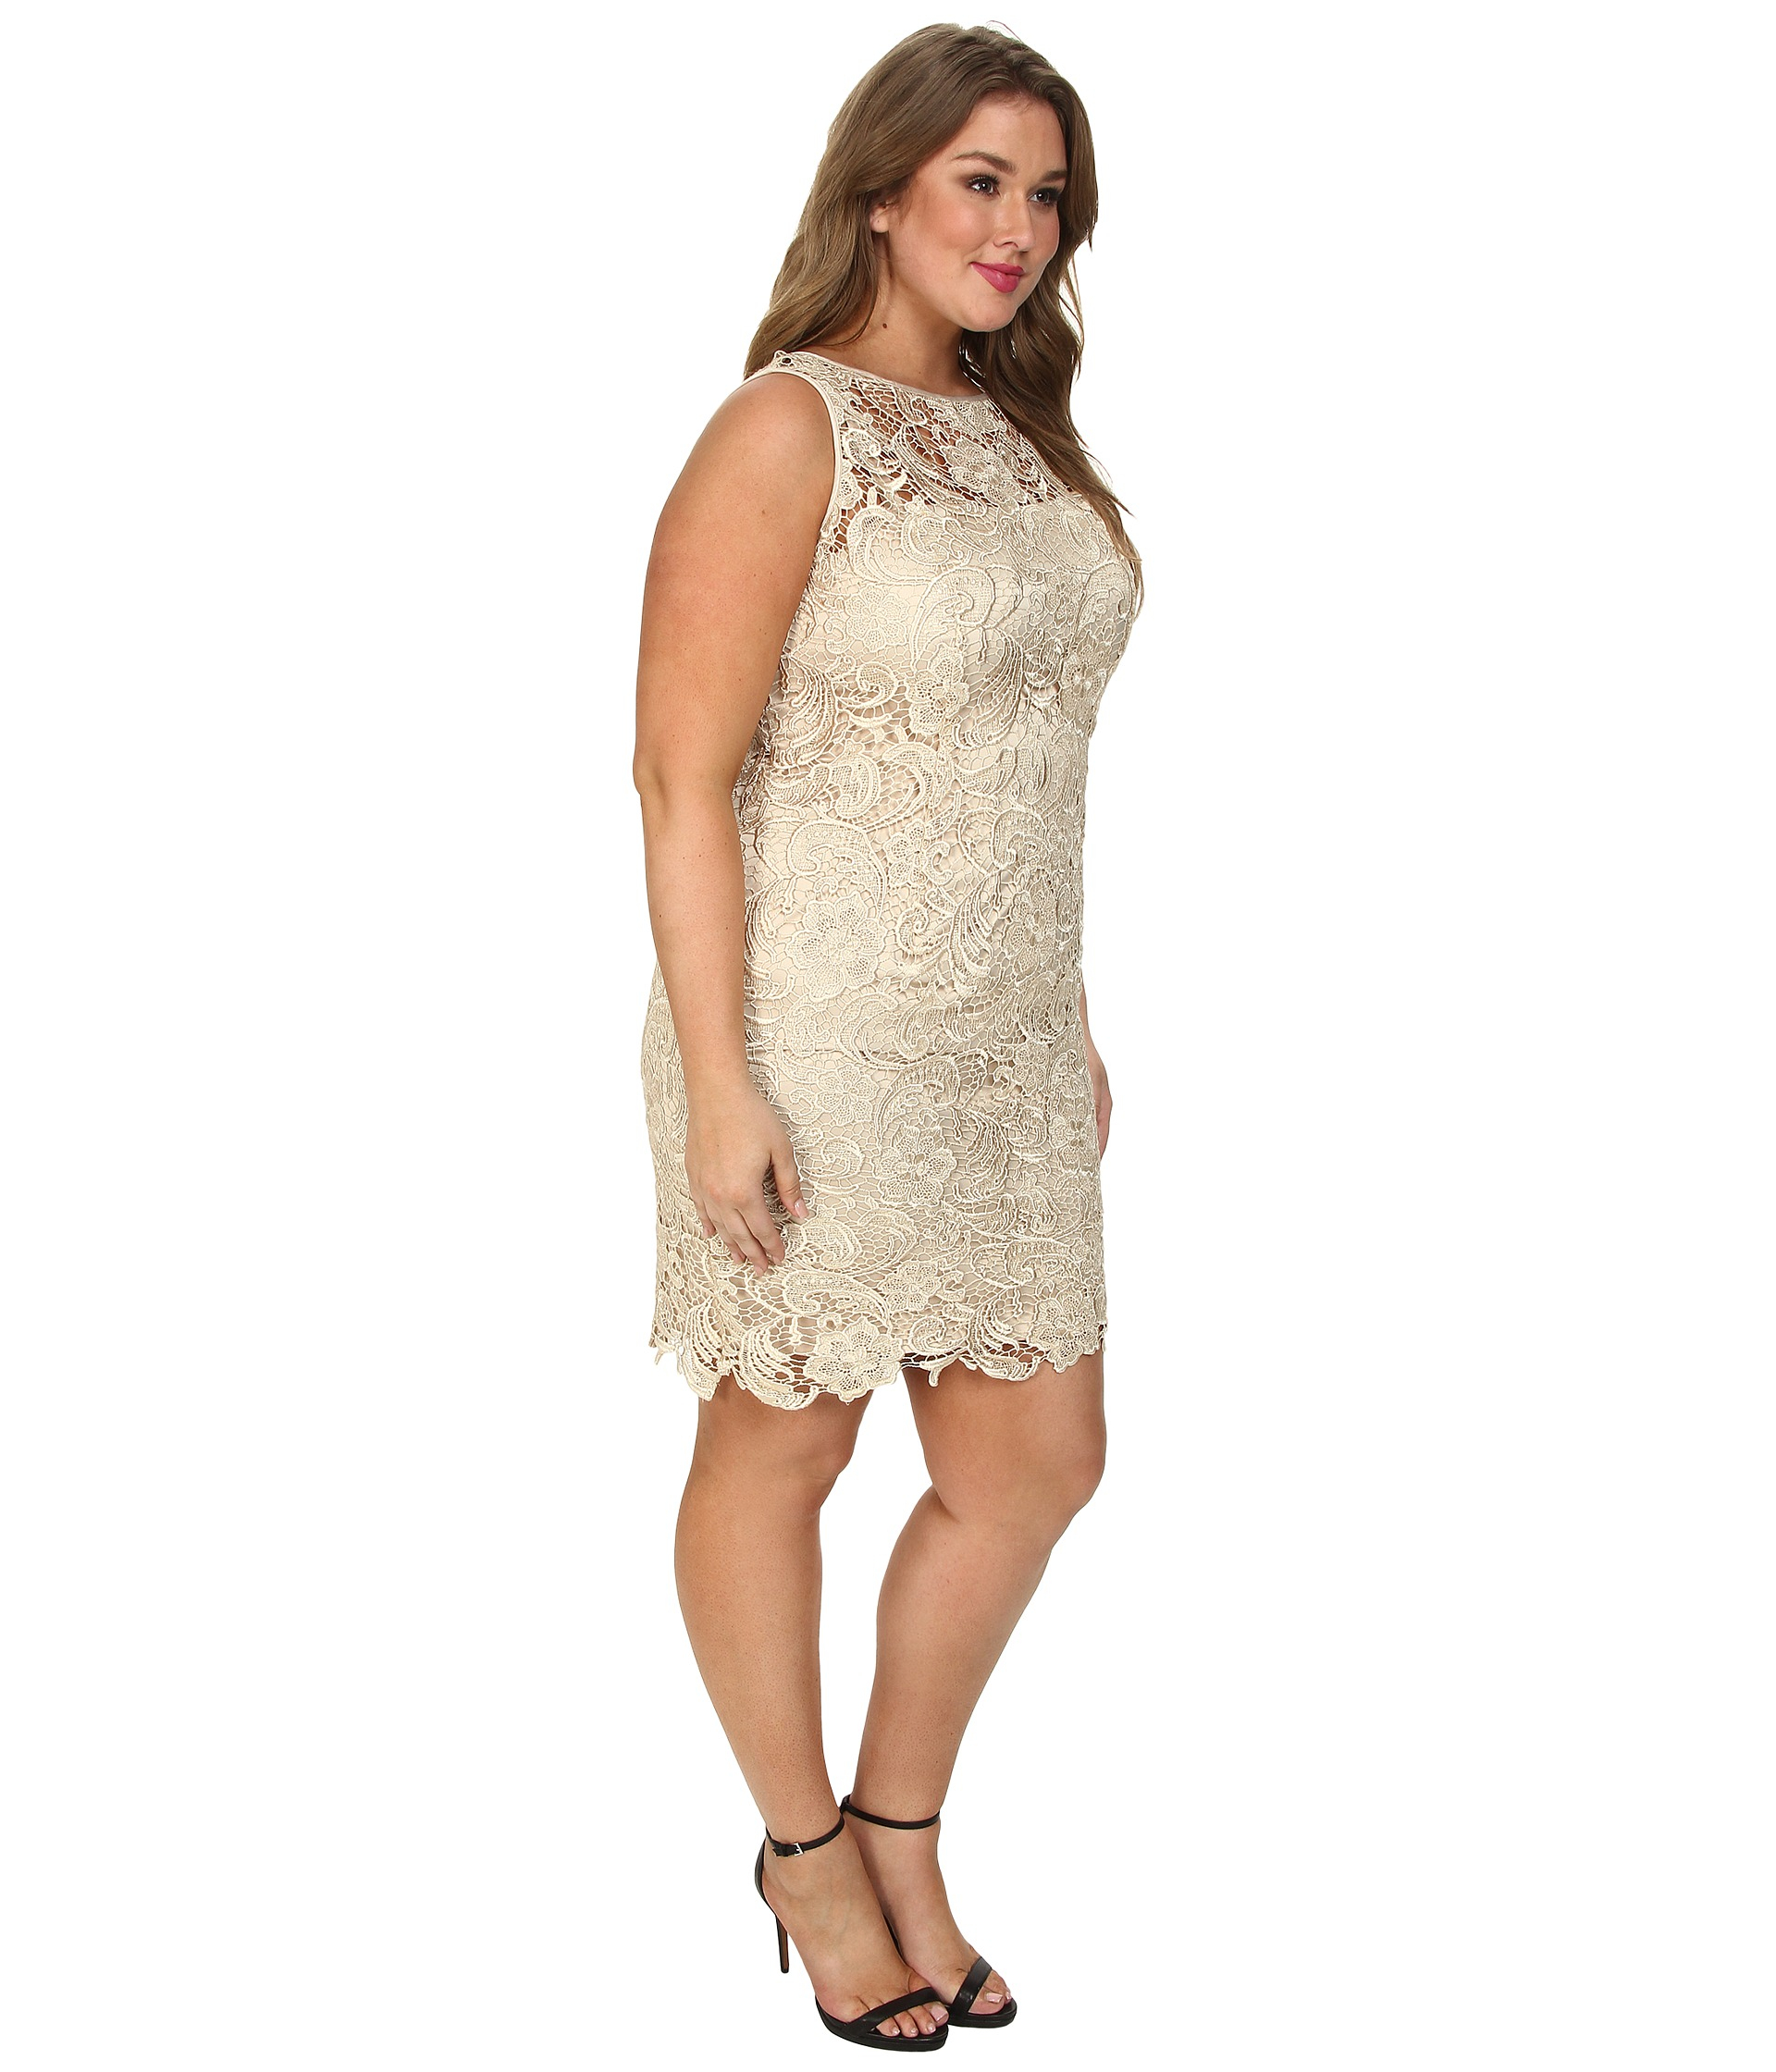 Cream Lace Dress Plus Size | Huston Fislar Photography